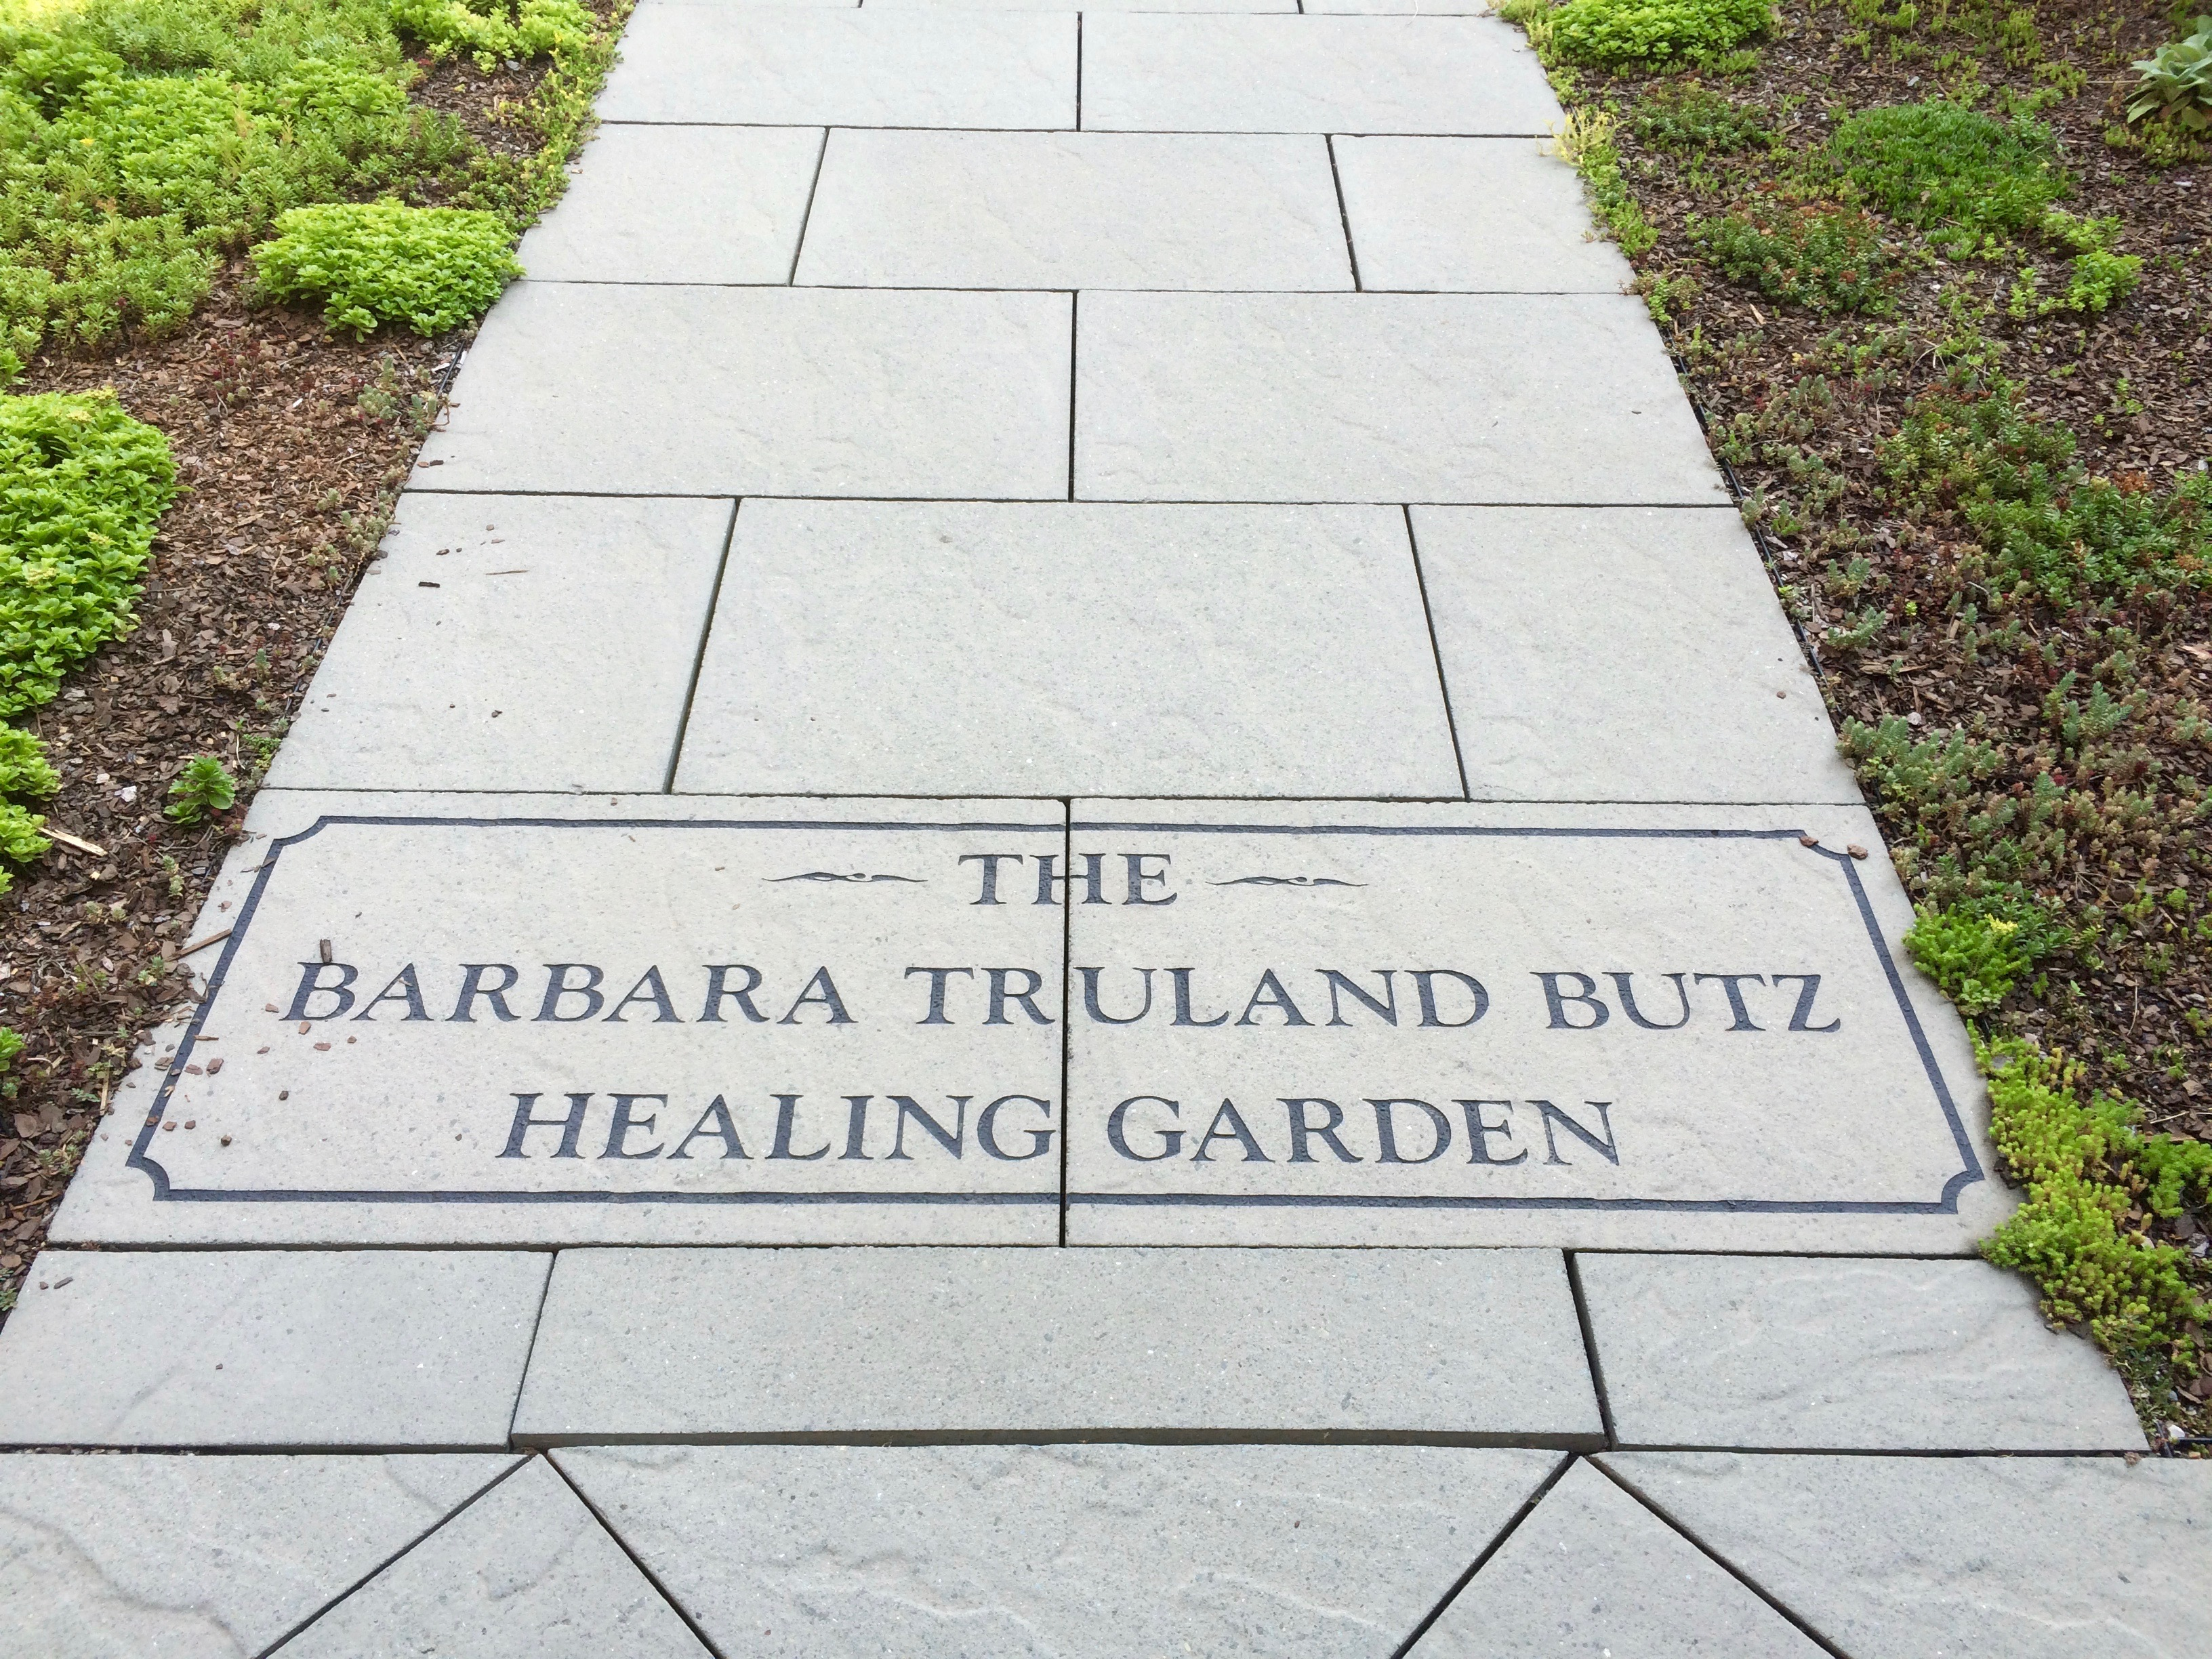 Barbara Truland Butz Healing Garden